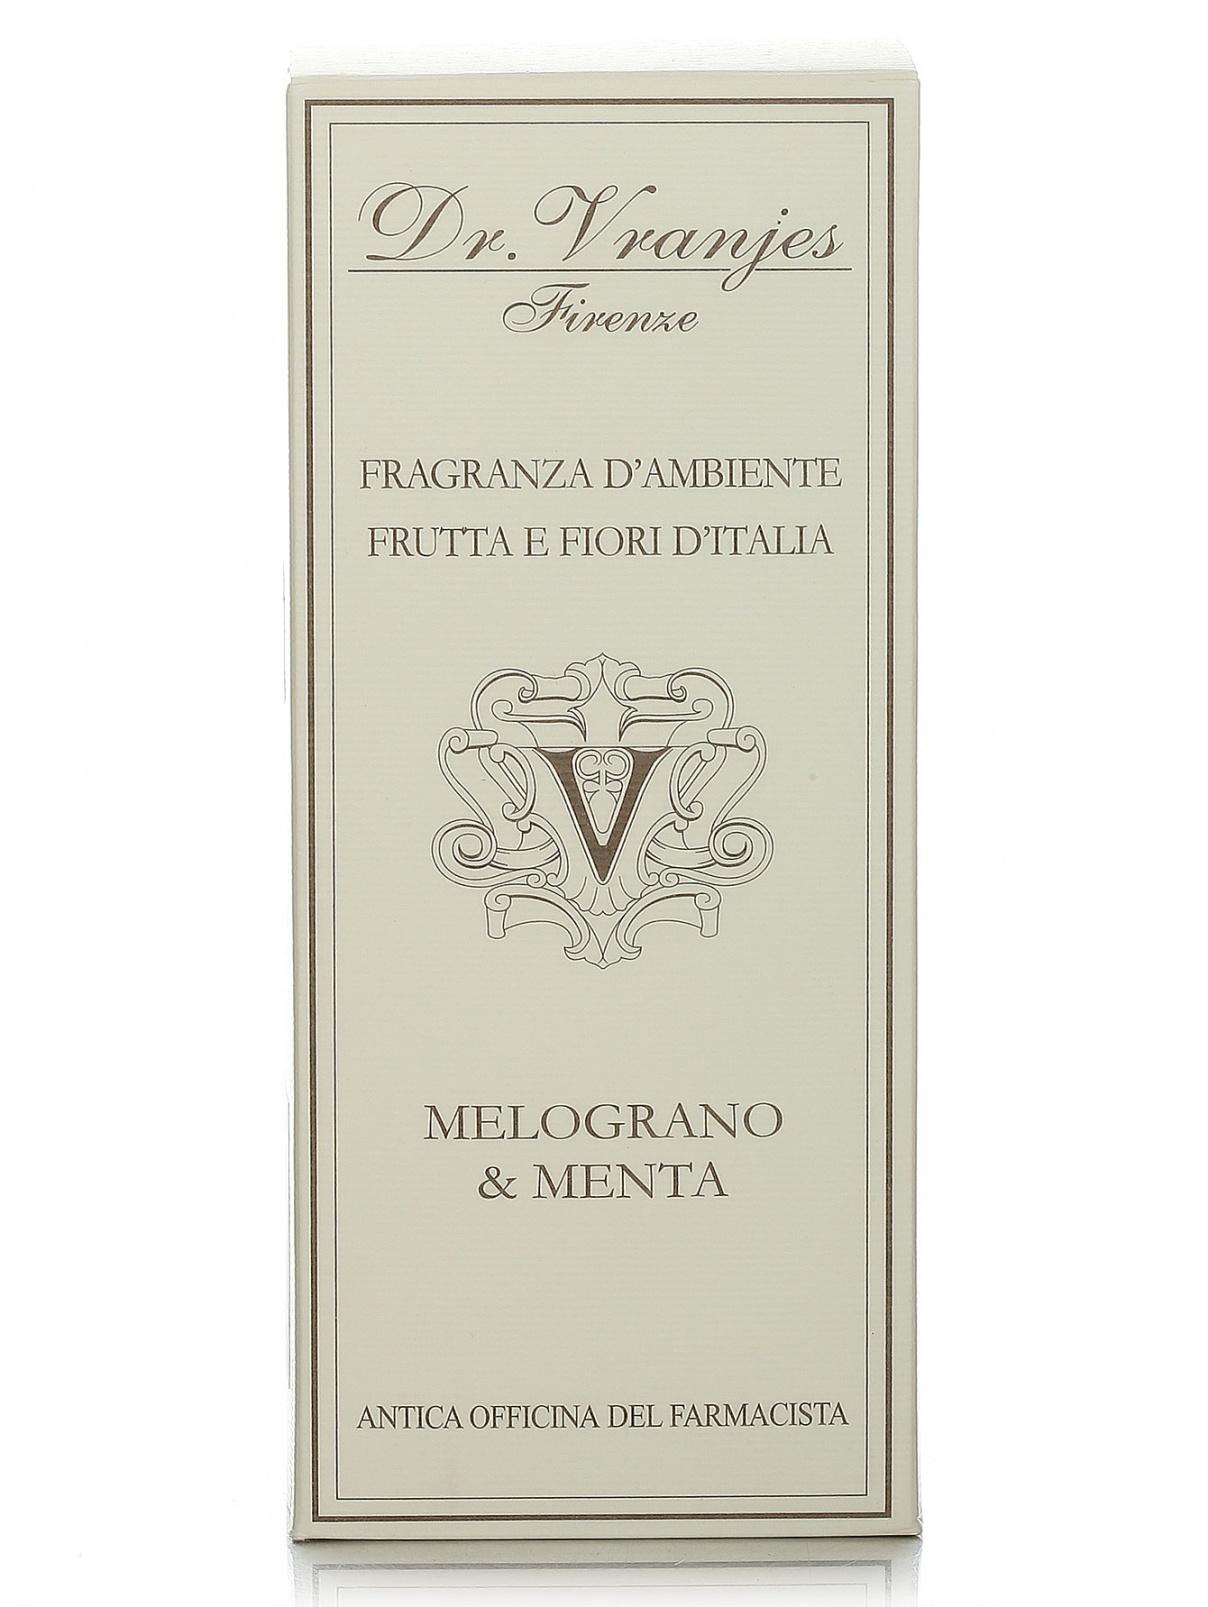 Ароматизатор воздуха Melograno & Menta - Home Fragrance, 250ml Dr. Vranjes  –  Модель Общий вид